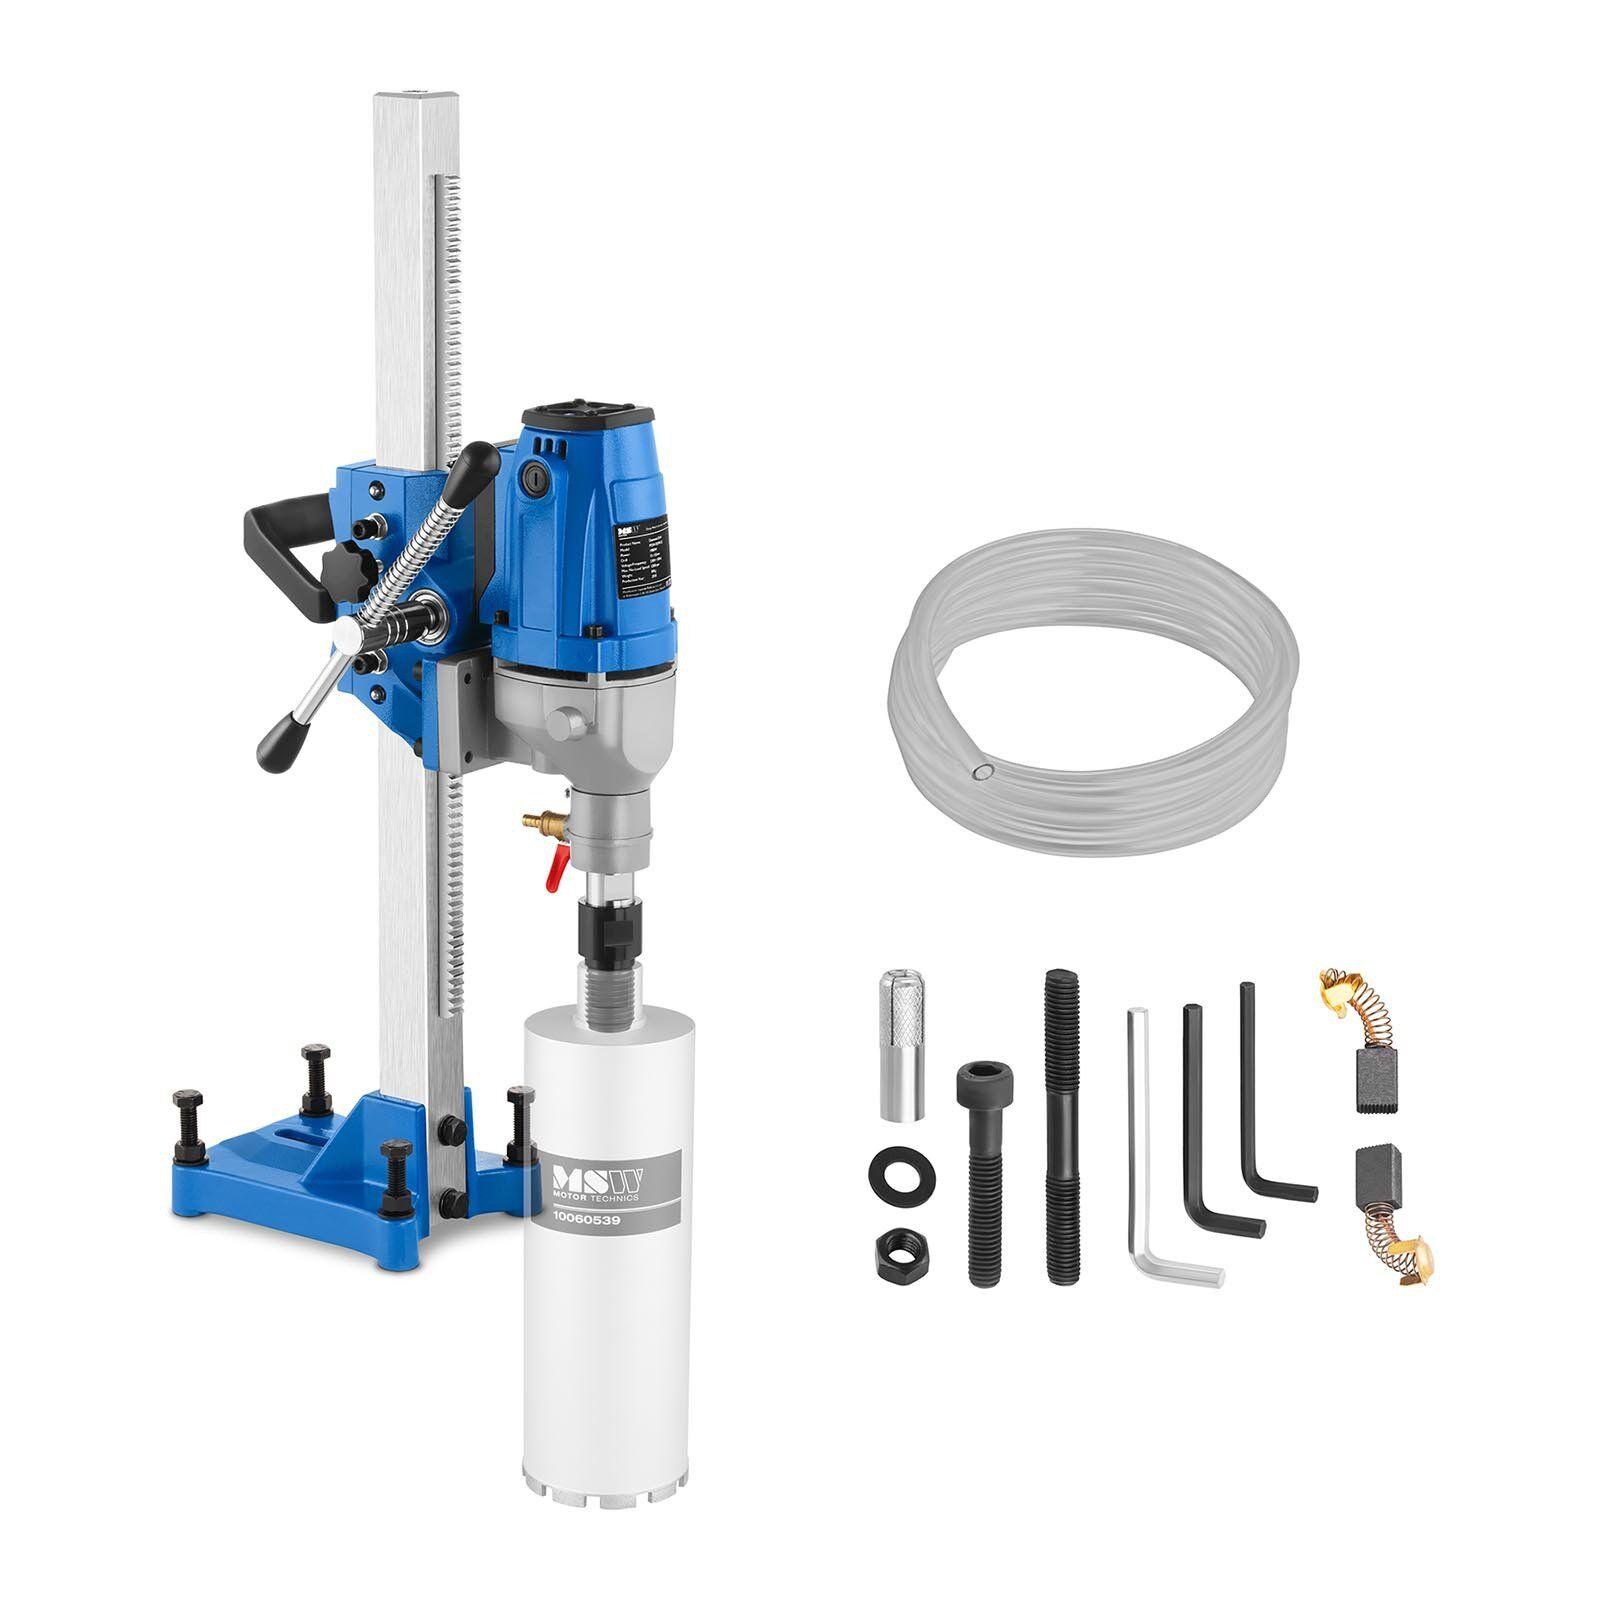 MSW Core Drilling Machine - 1.980 Watt - 1.200 r/min